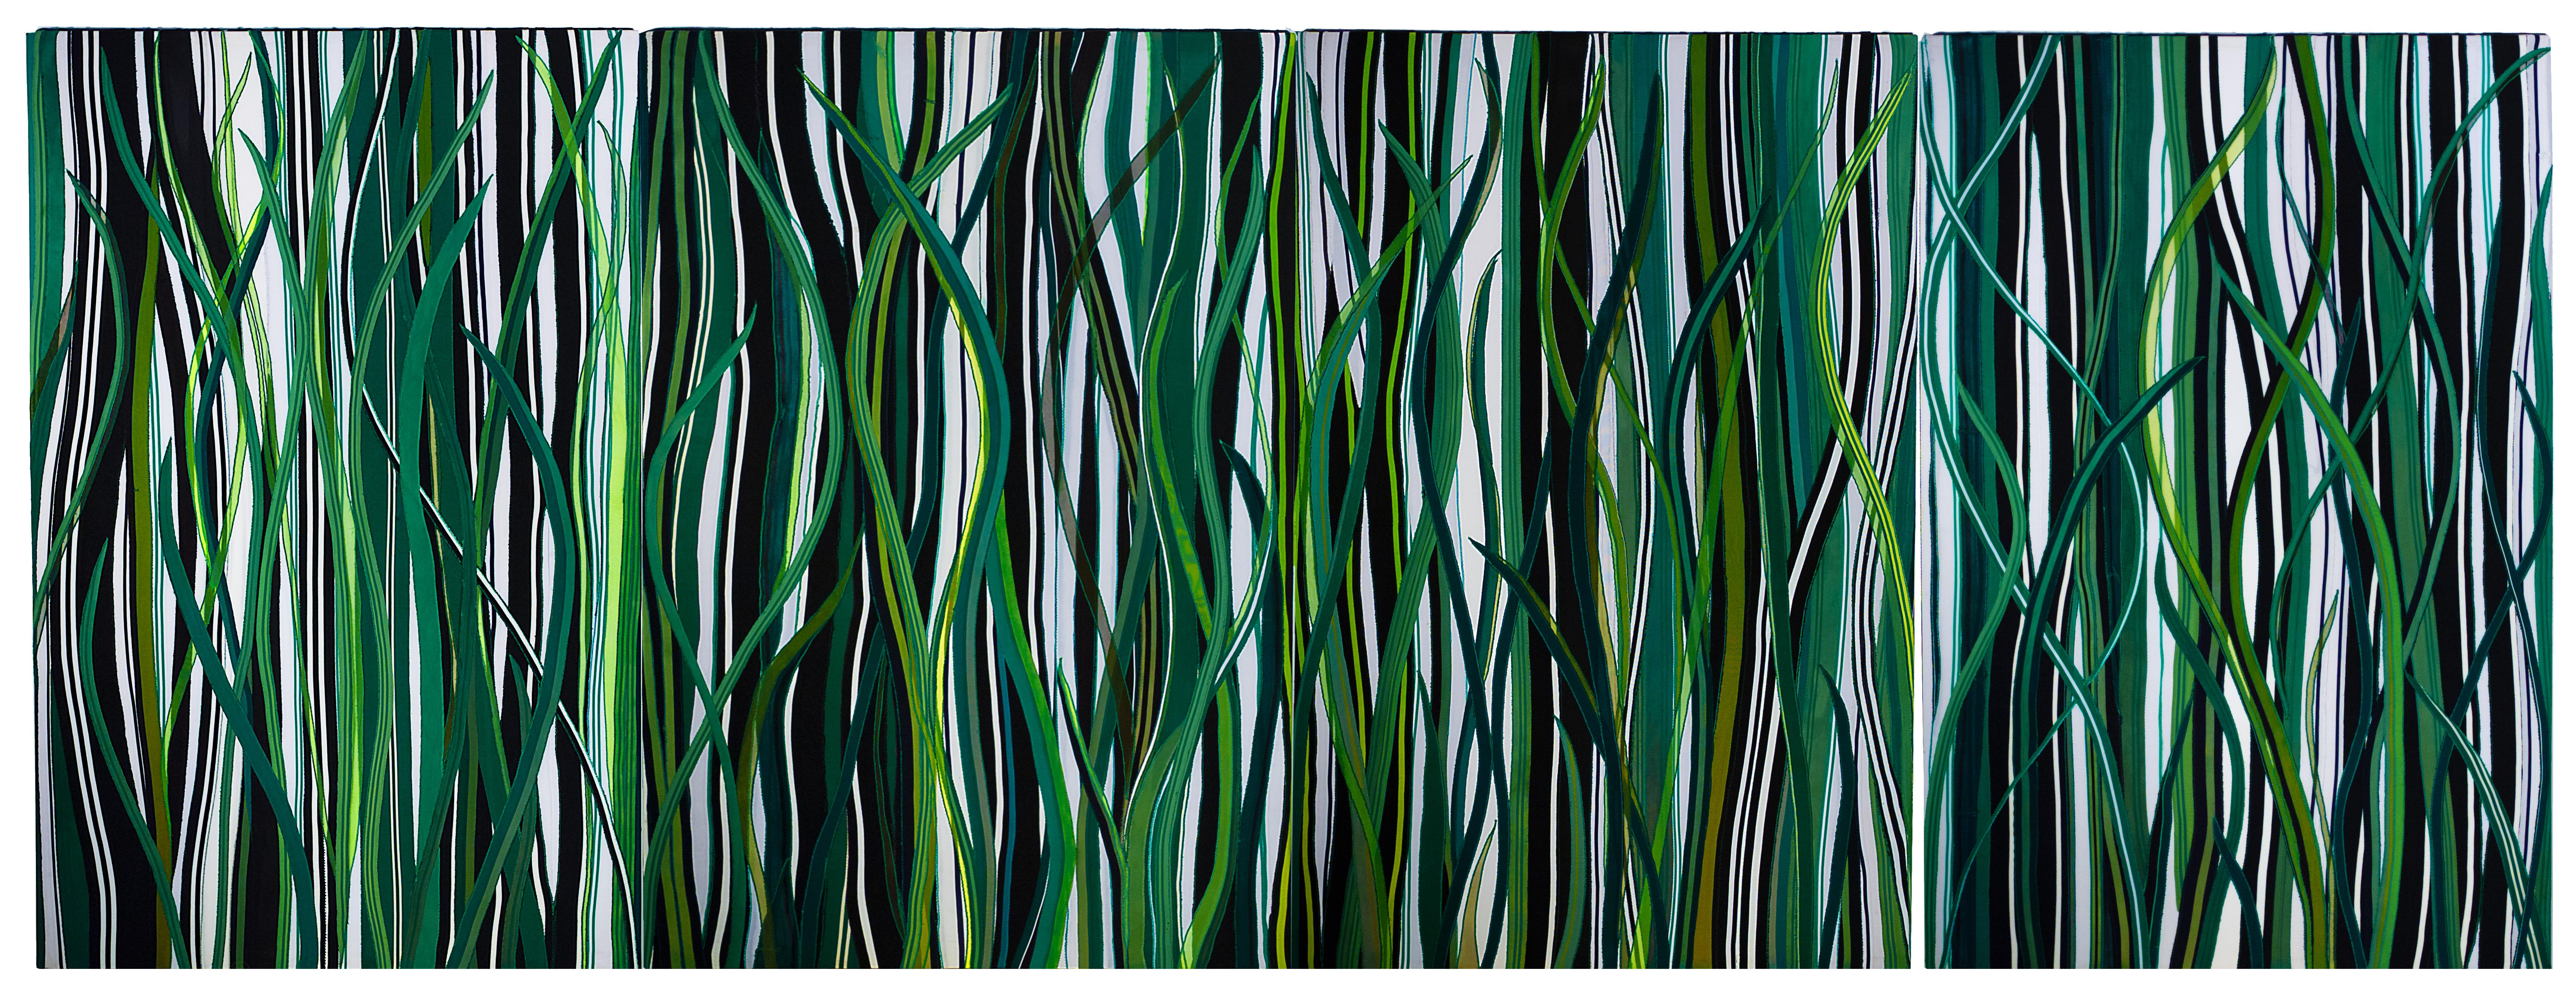 Textile 6' high x 16' wide